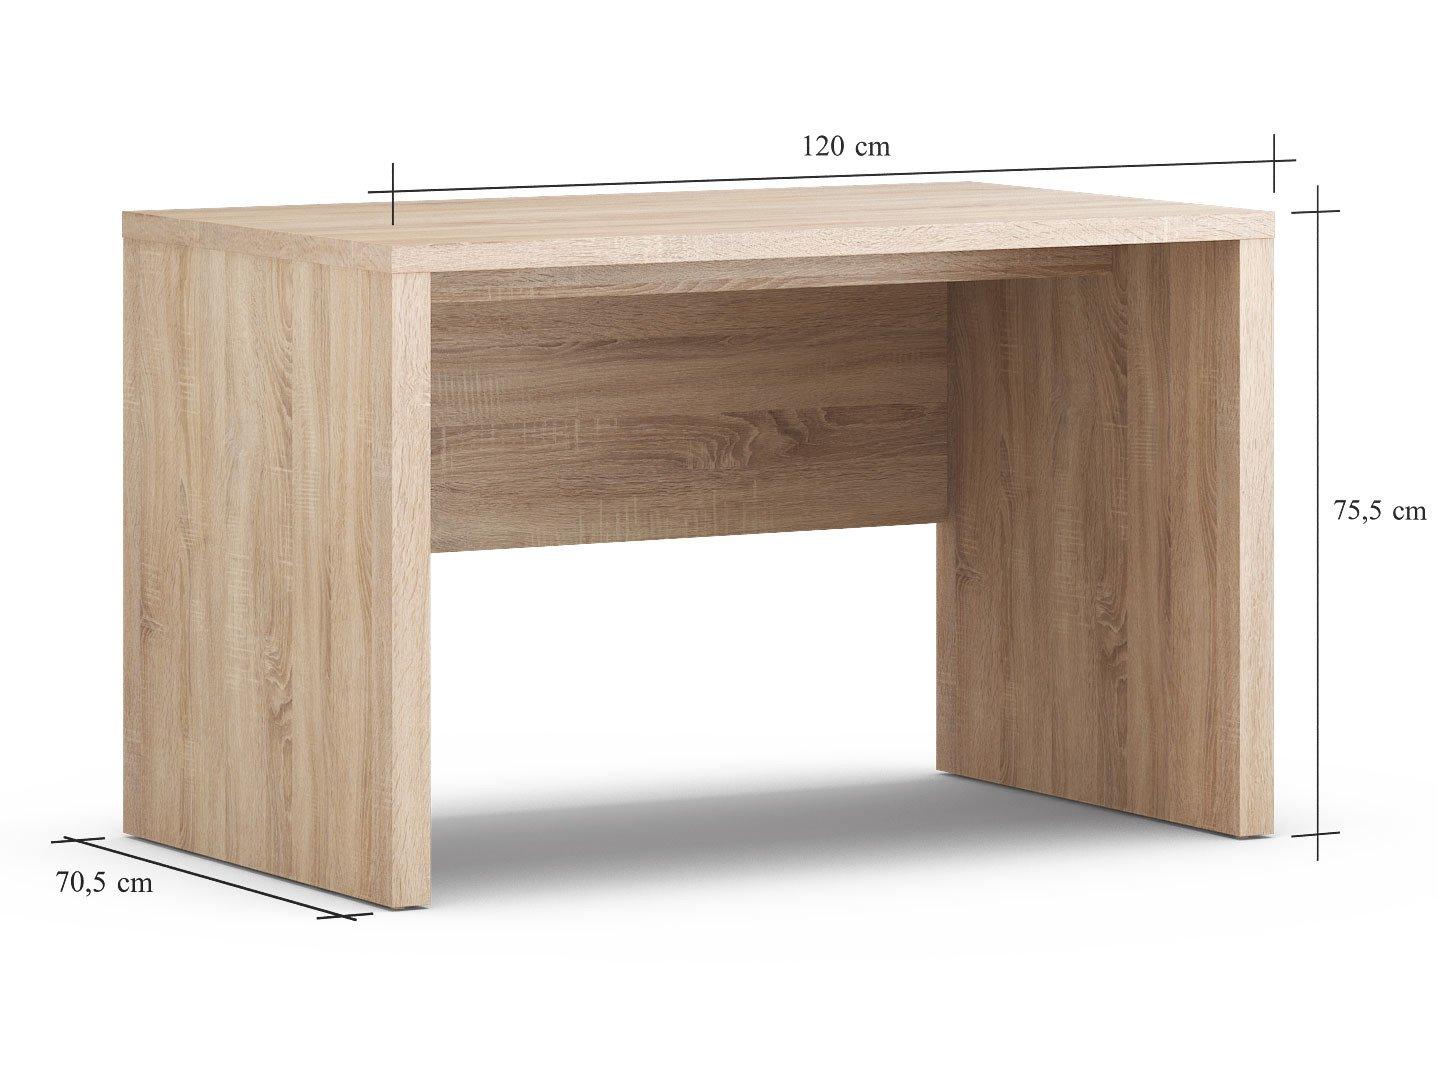 oak office table. Simple Office Black Red White VENOM MIX  120cm Wide Quality Desk Bright Oak Pattern In Office Table